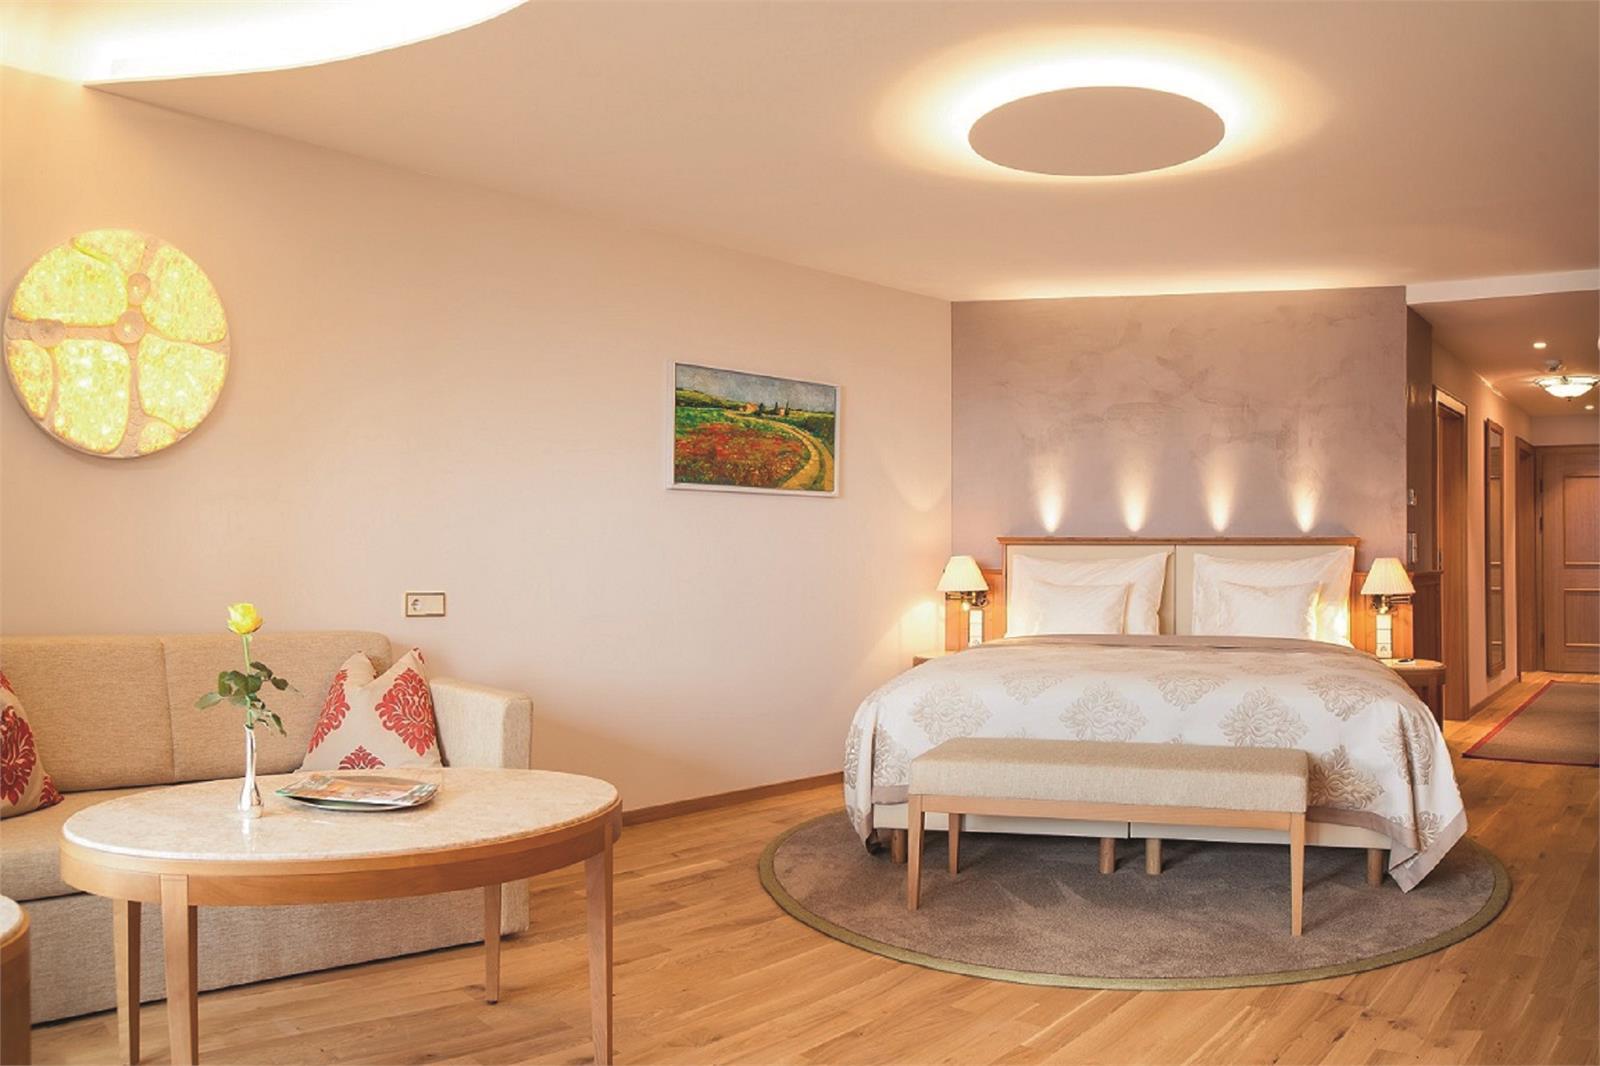 Hotelzimmer Vollererhof | ©Vollererhof.at